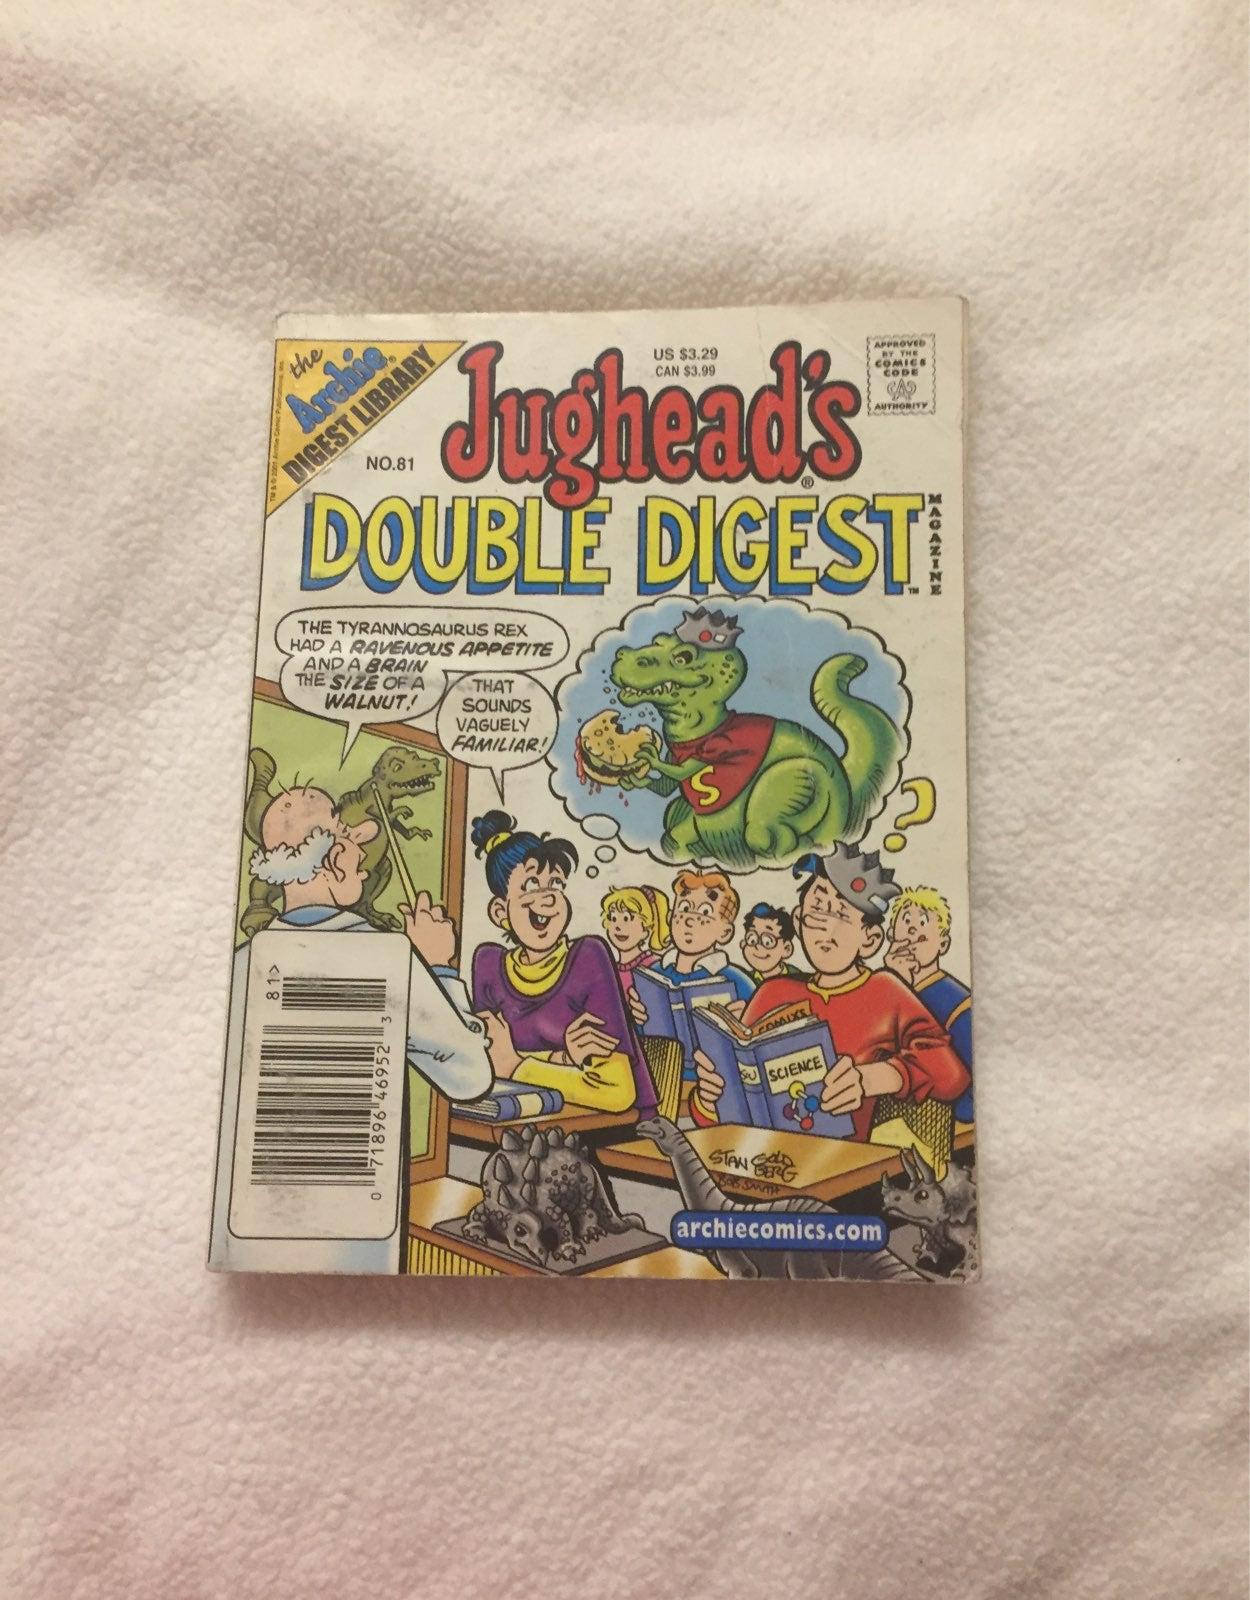 Jughead's double digest no. 81